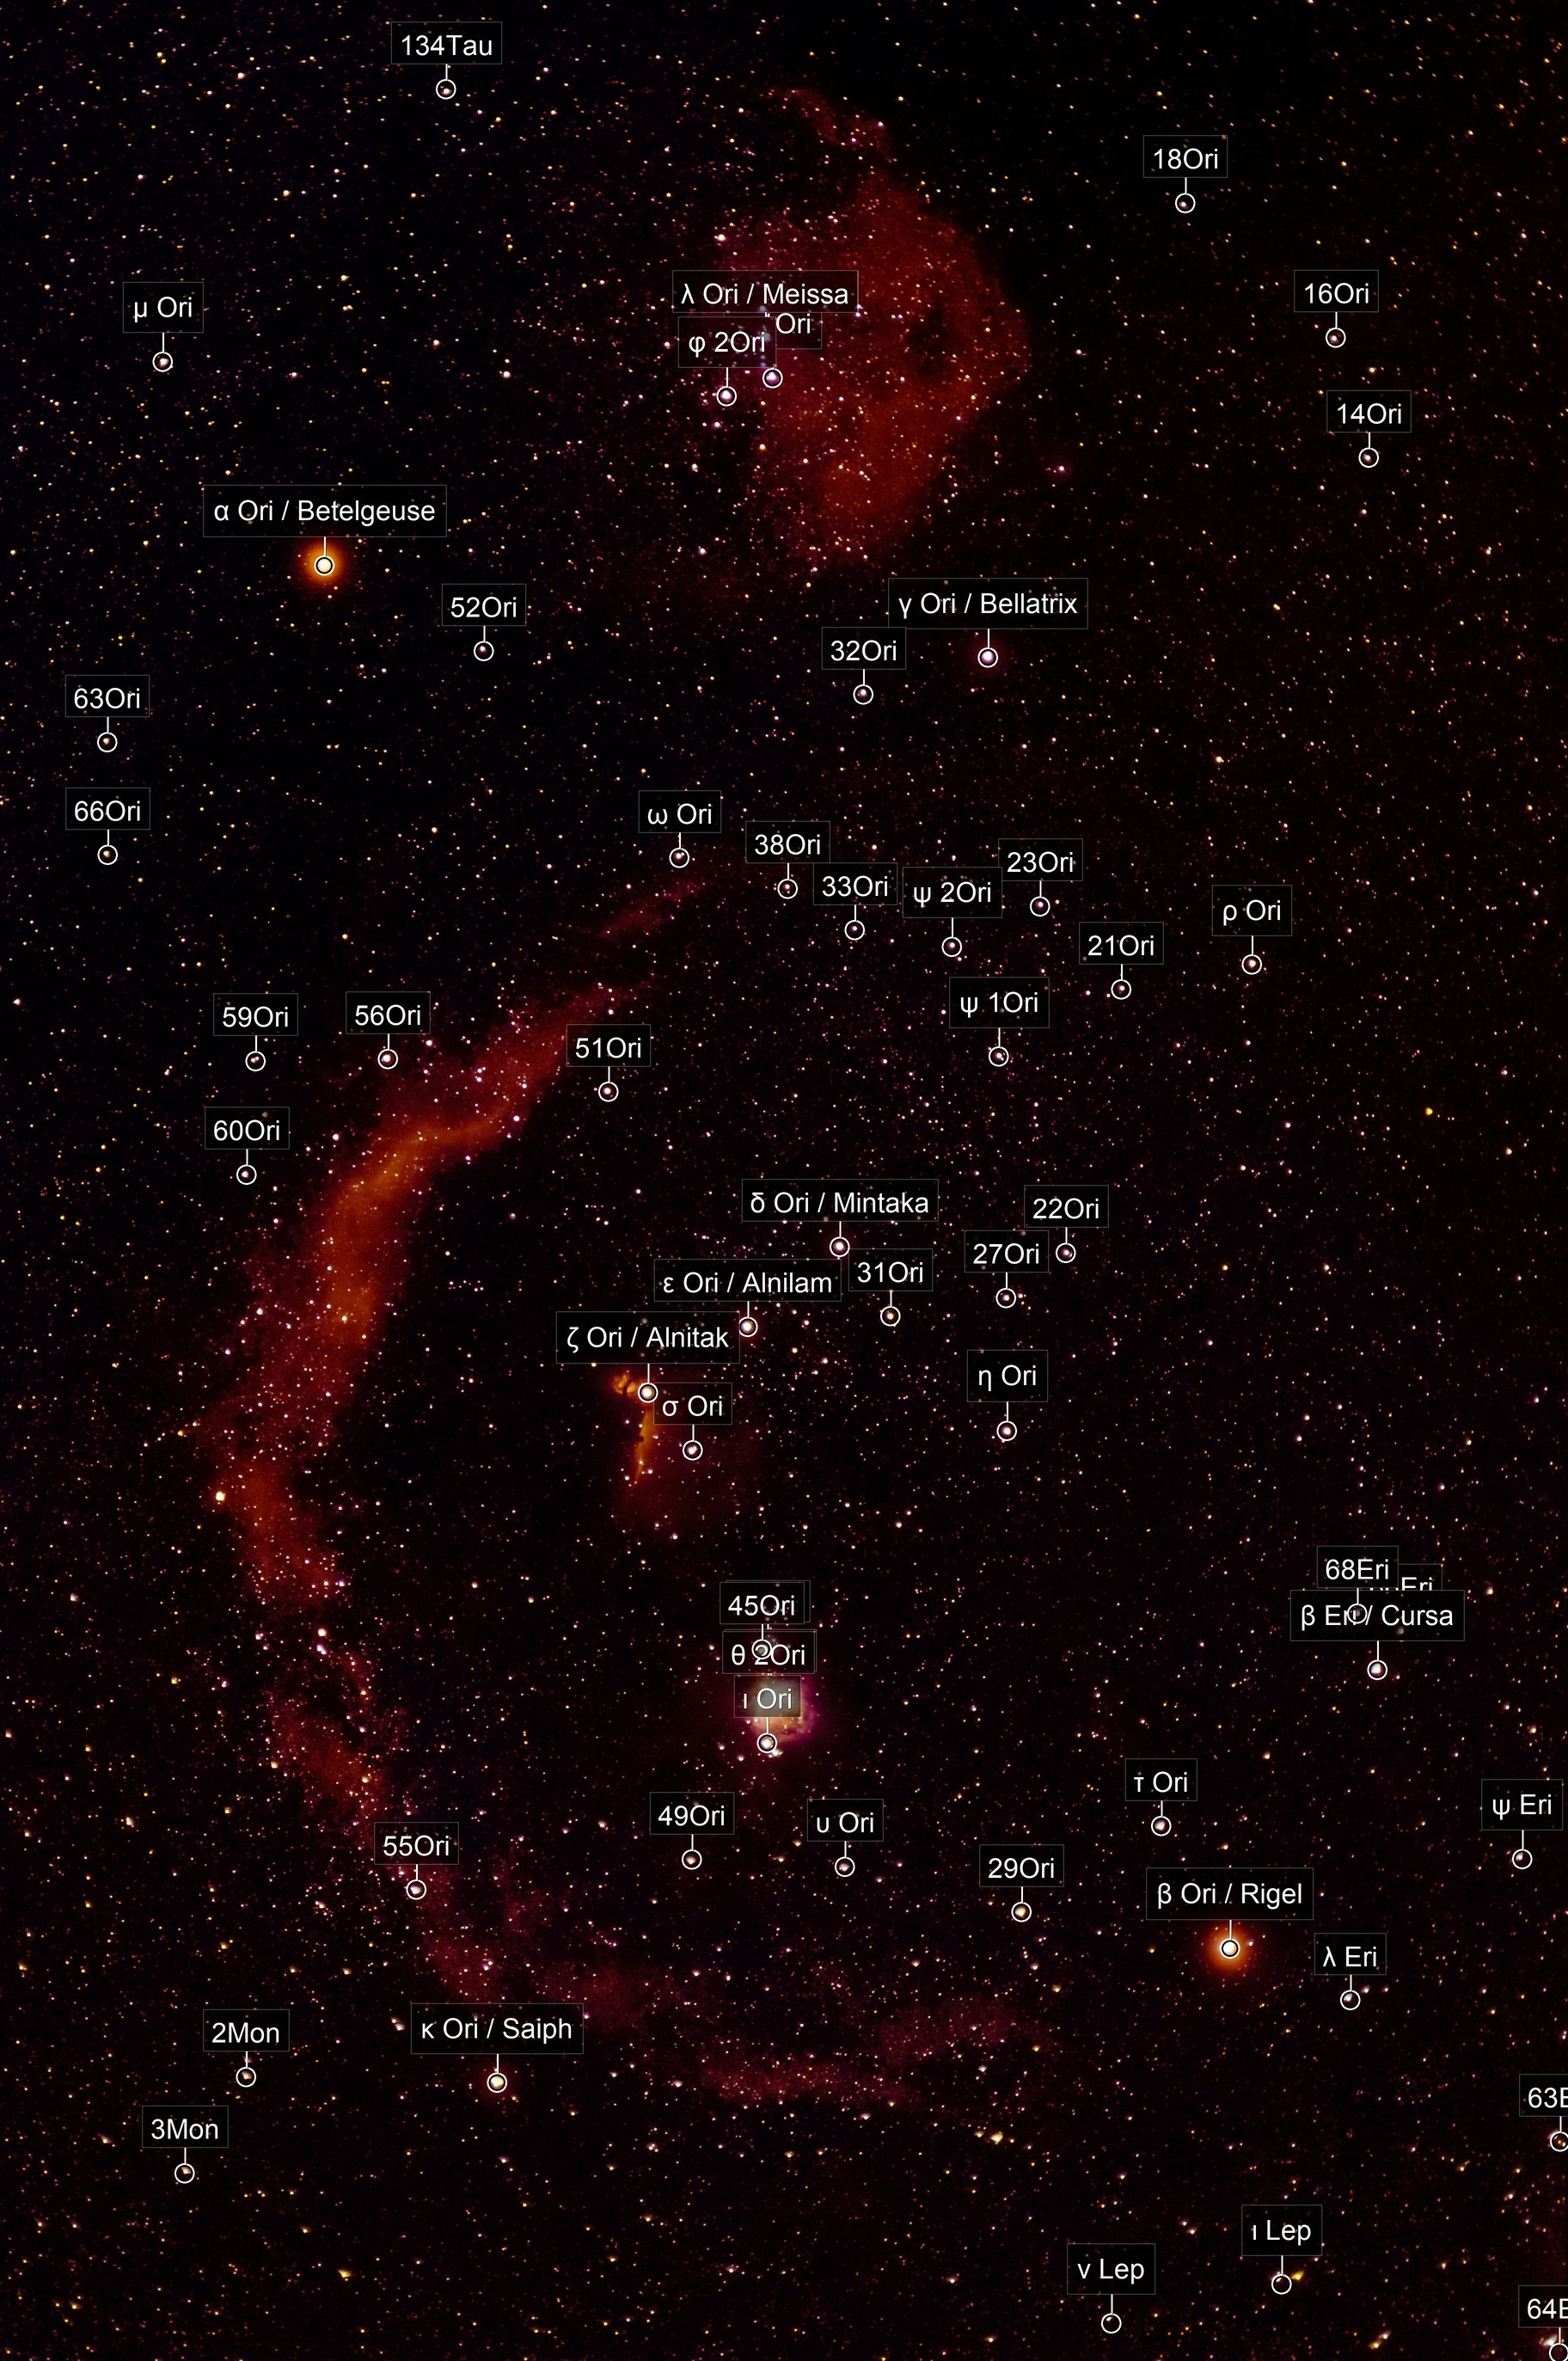 SH2 276 - Barnard's Loop and SH2 264 - Angelfish Nebula, in Orion